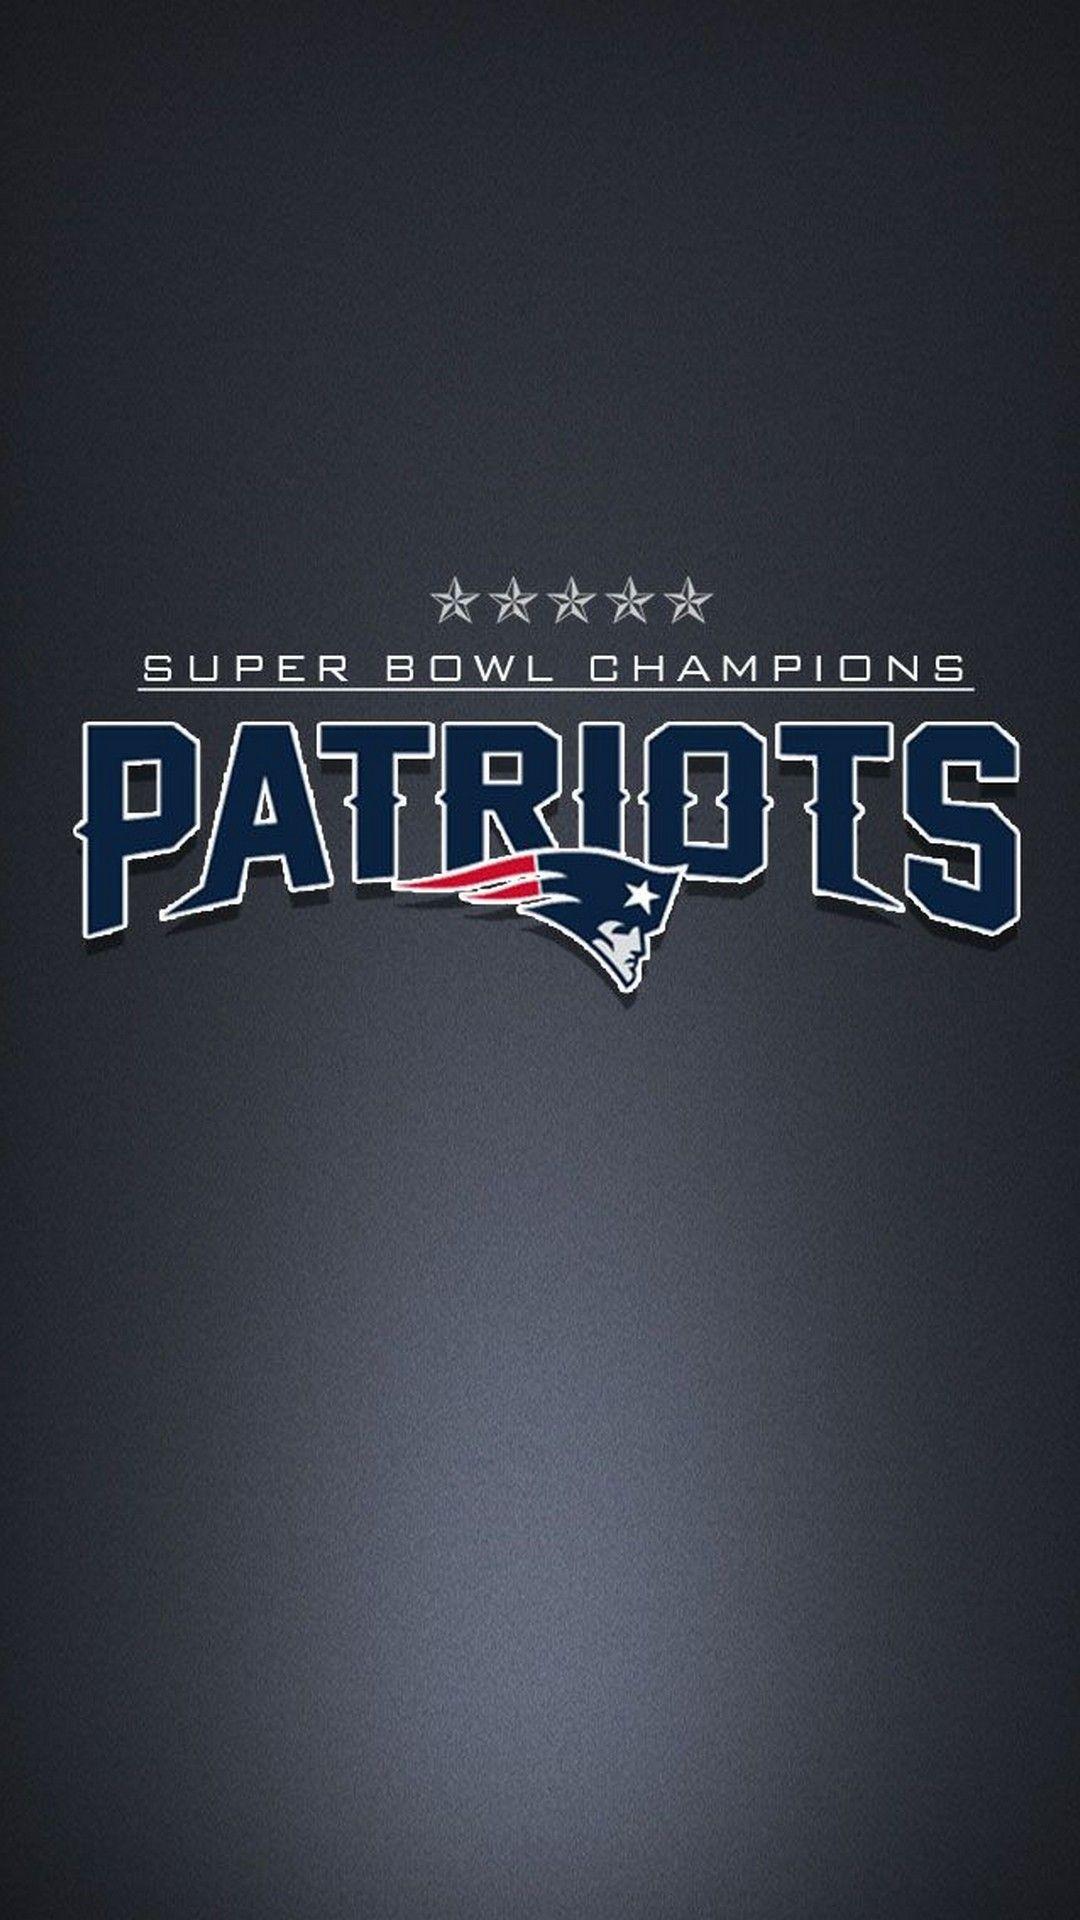 New England Patriots Iphone Home Screen Wallpaper Best Nfl